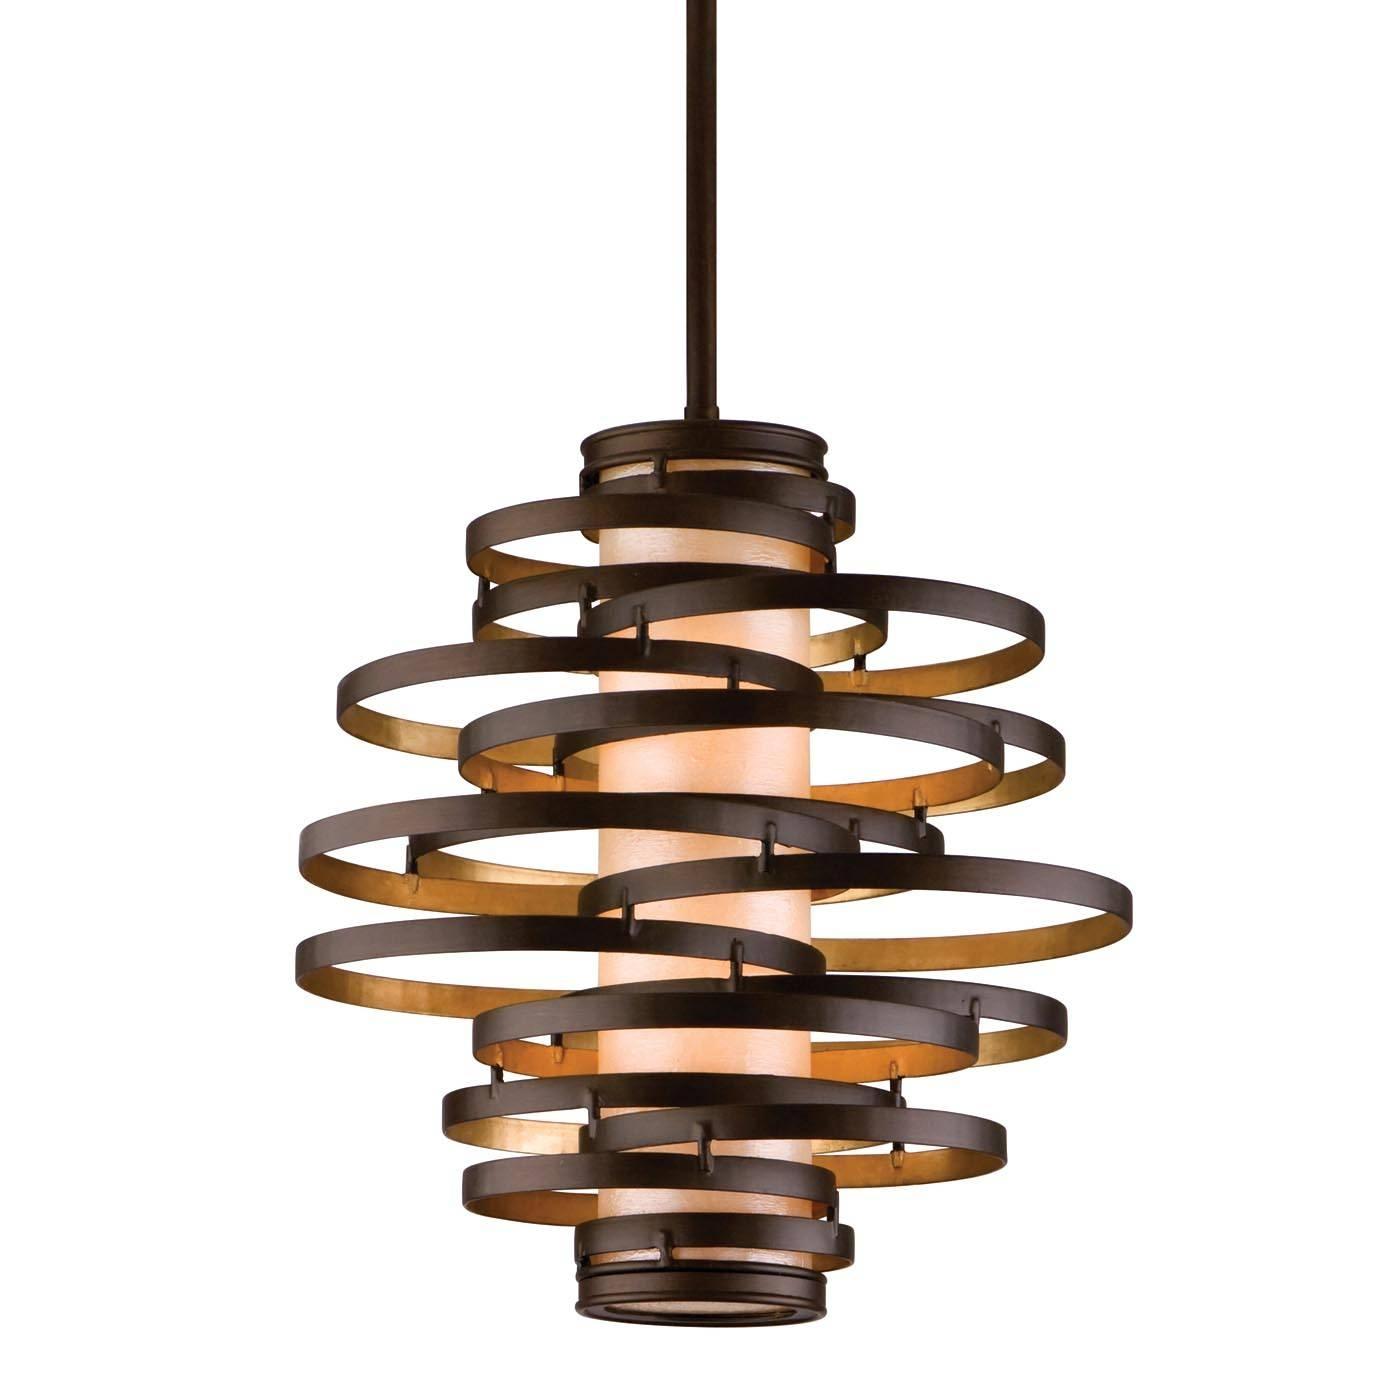 Industrial Pendant Lighting Canada | Roselawnlutheran in Exterior Pendant Lights Australia (Image 6 of 15)